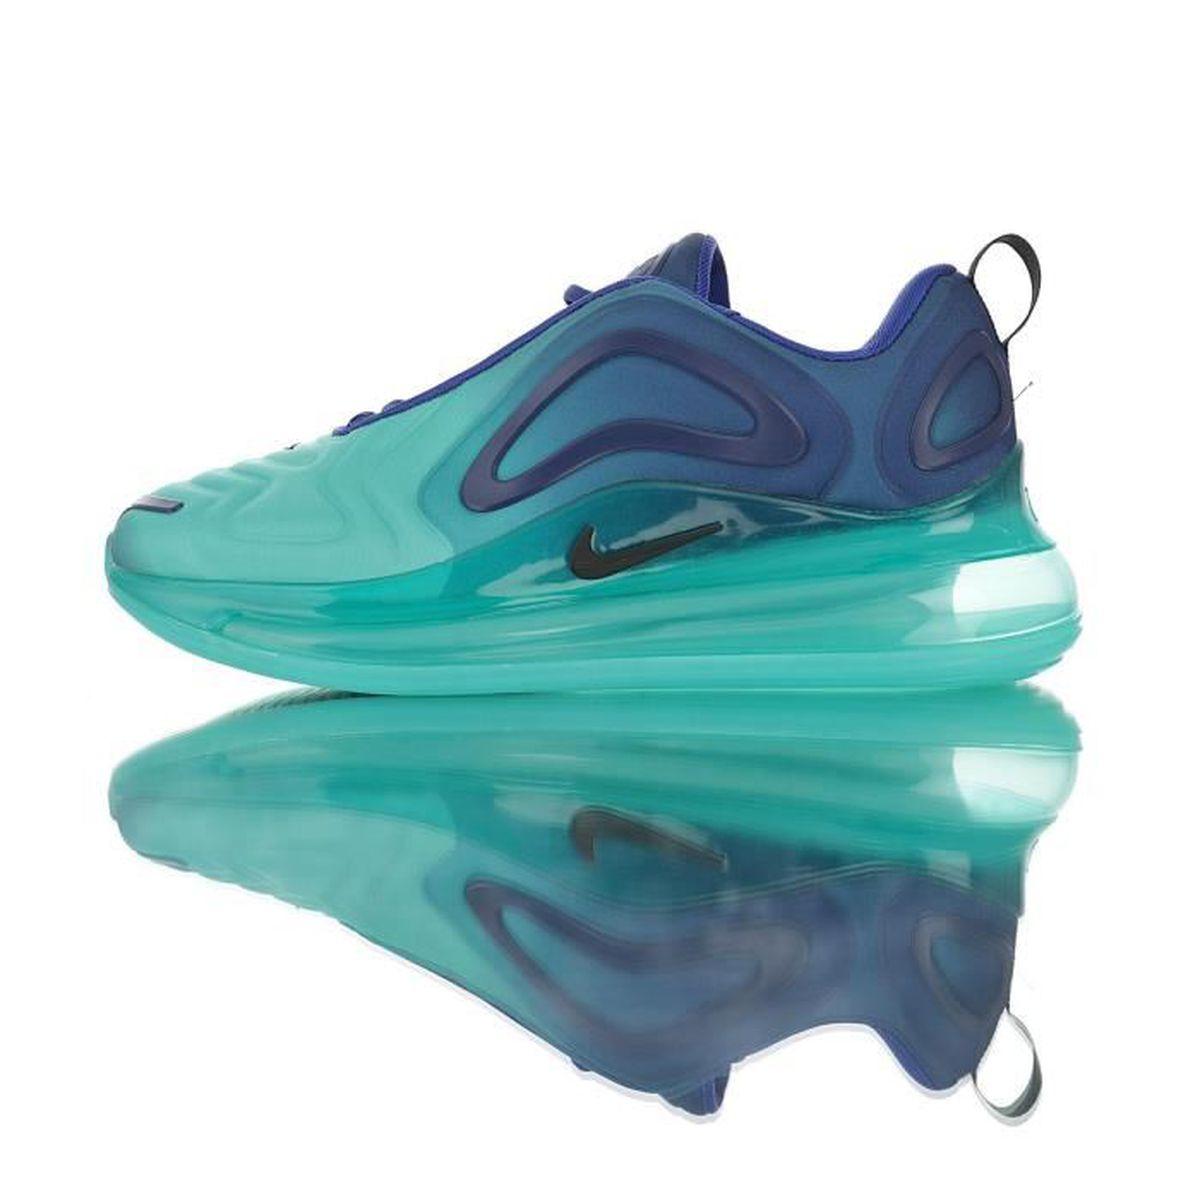 top fashion run shoes best shoes Baskets Nike Air Max 720 Homme et Femme Vert Running Chaussures ...